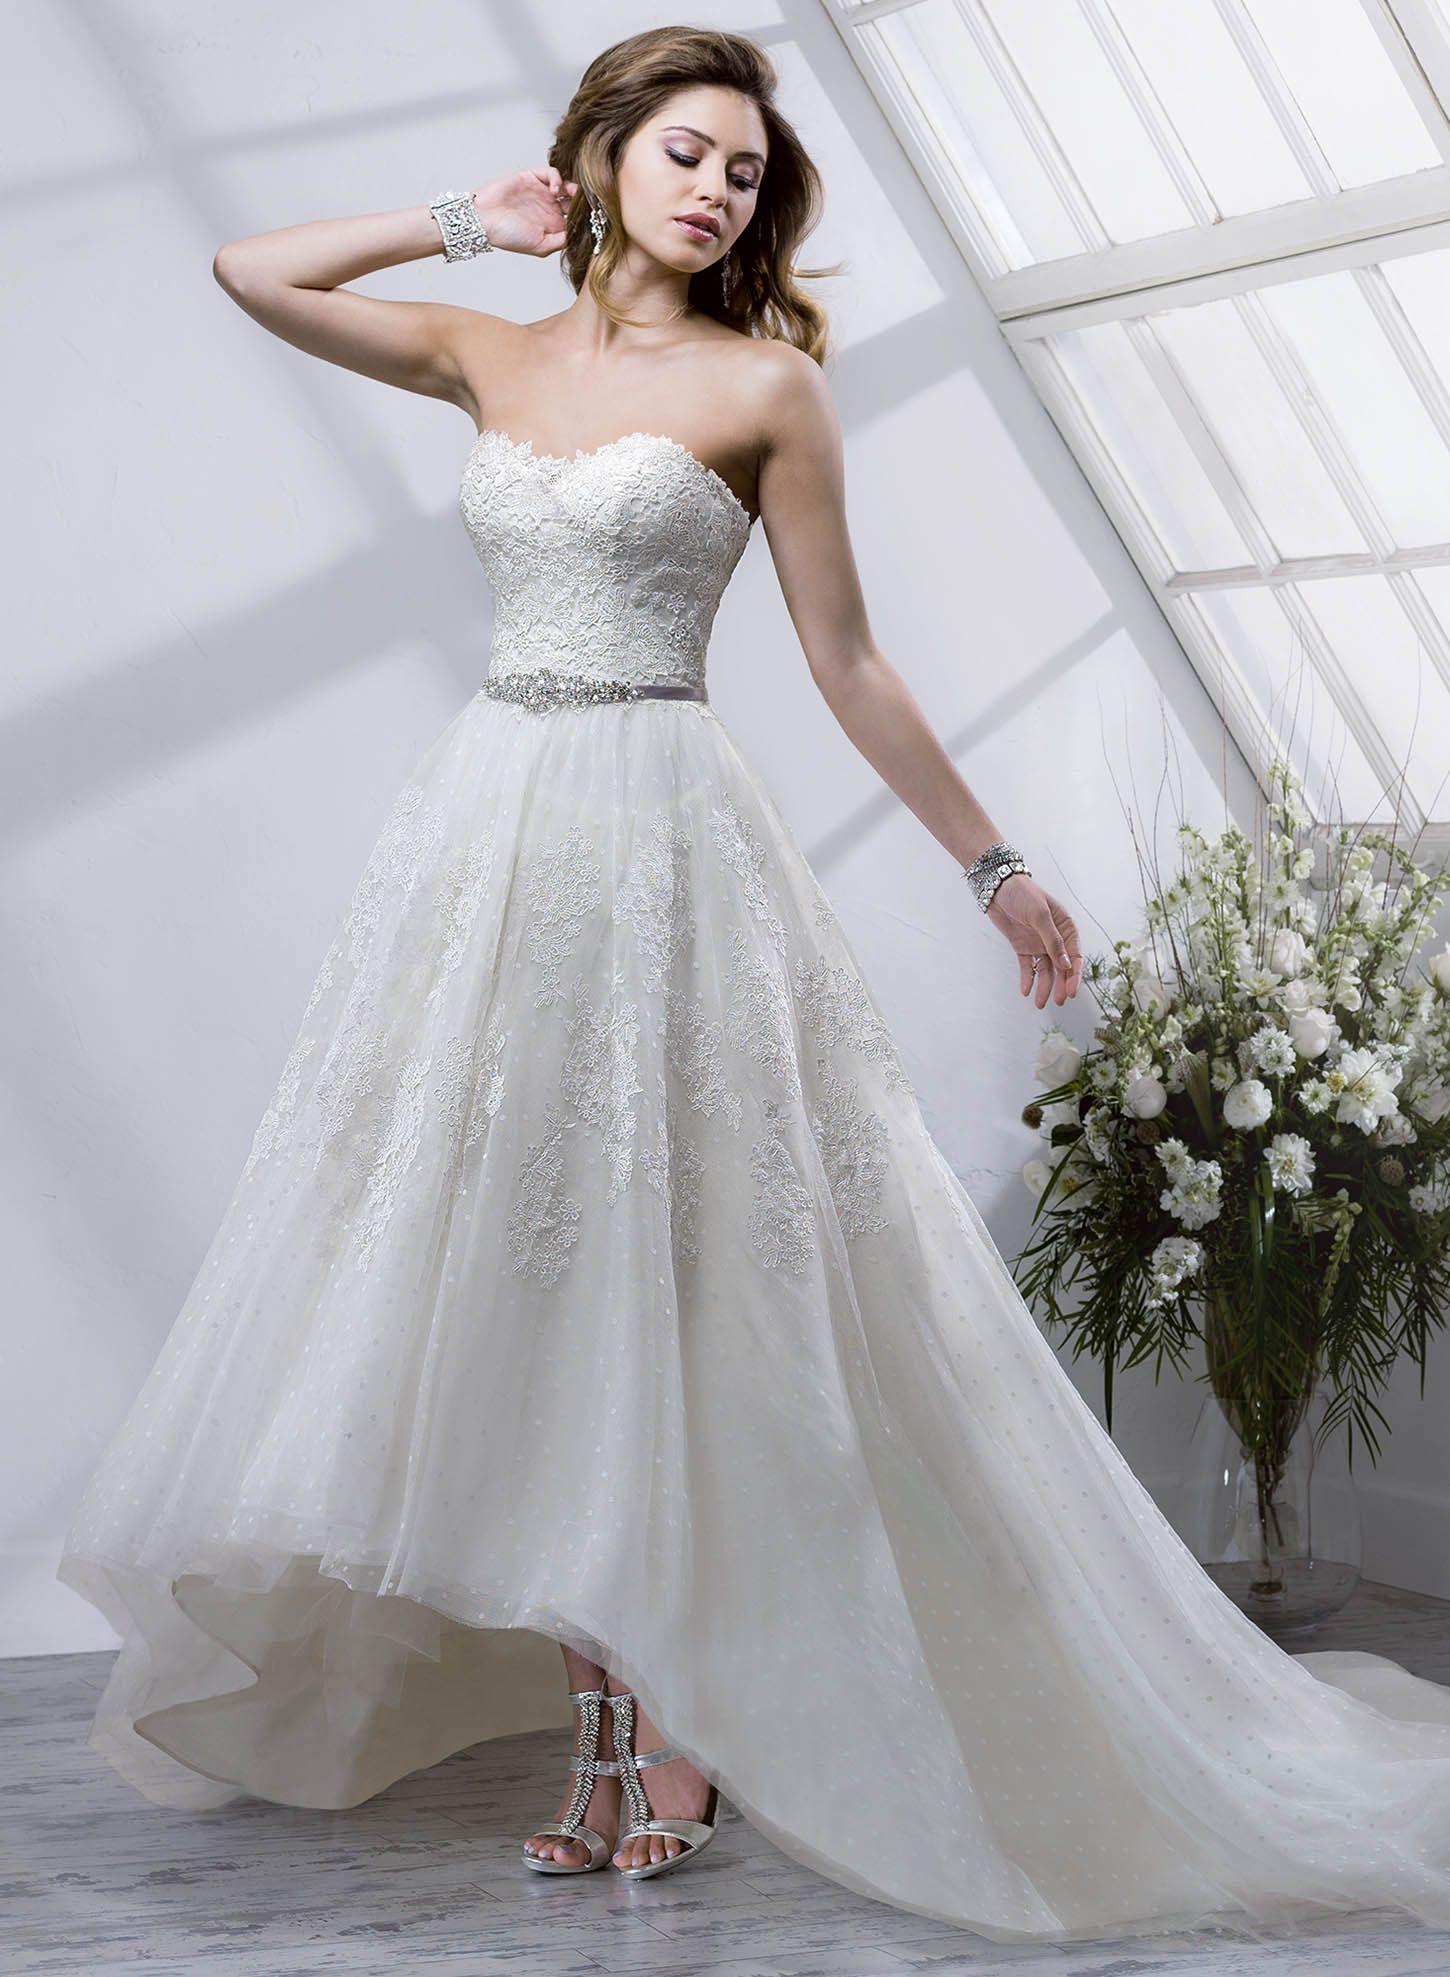 Maggie Sottero Wedding Dresses | Pinterest | Wedding dress, Weddings ...